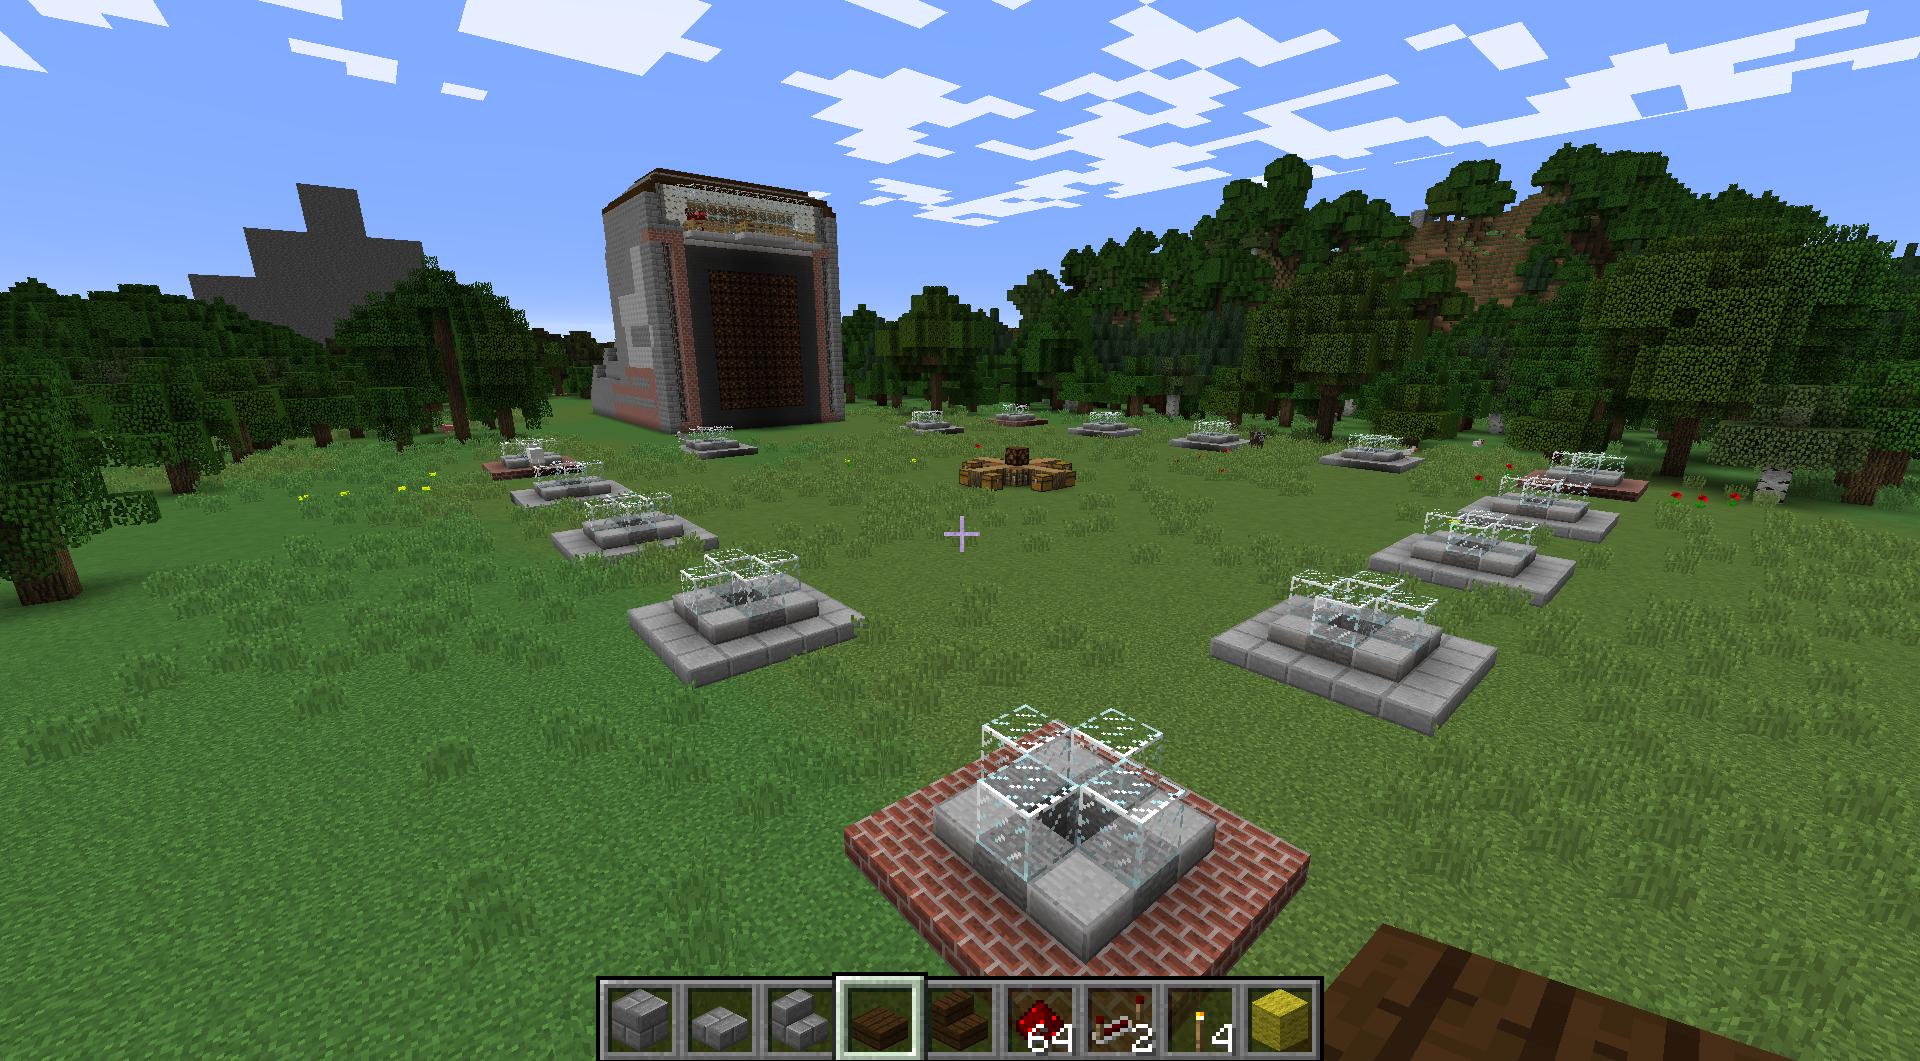 Hunger Games Map addon - Minecraft - Mod DB